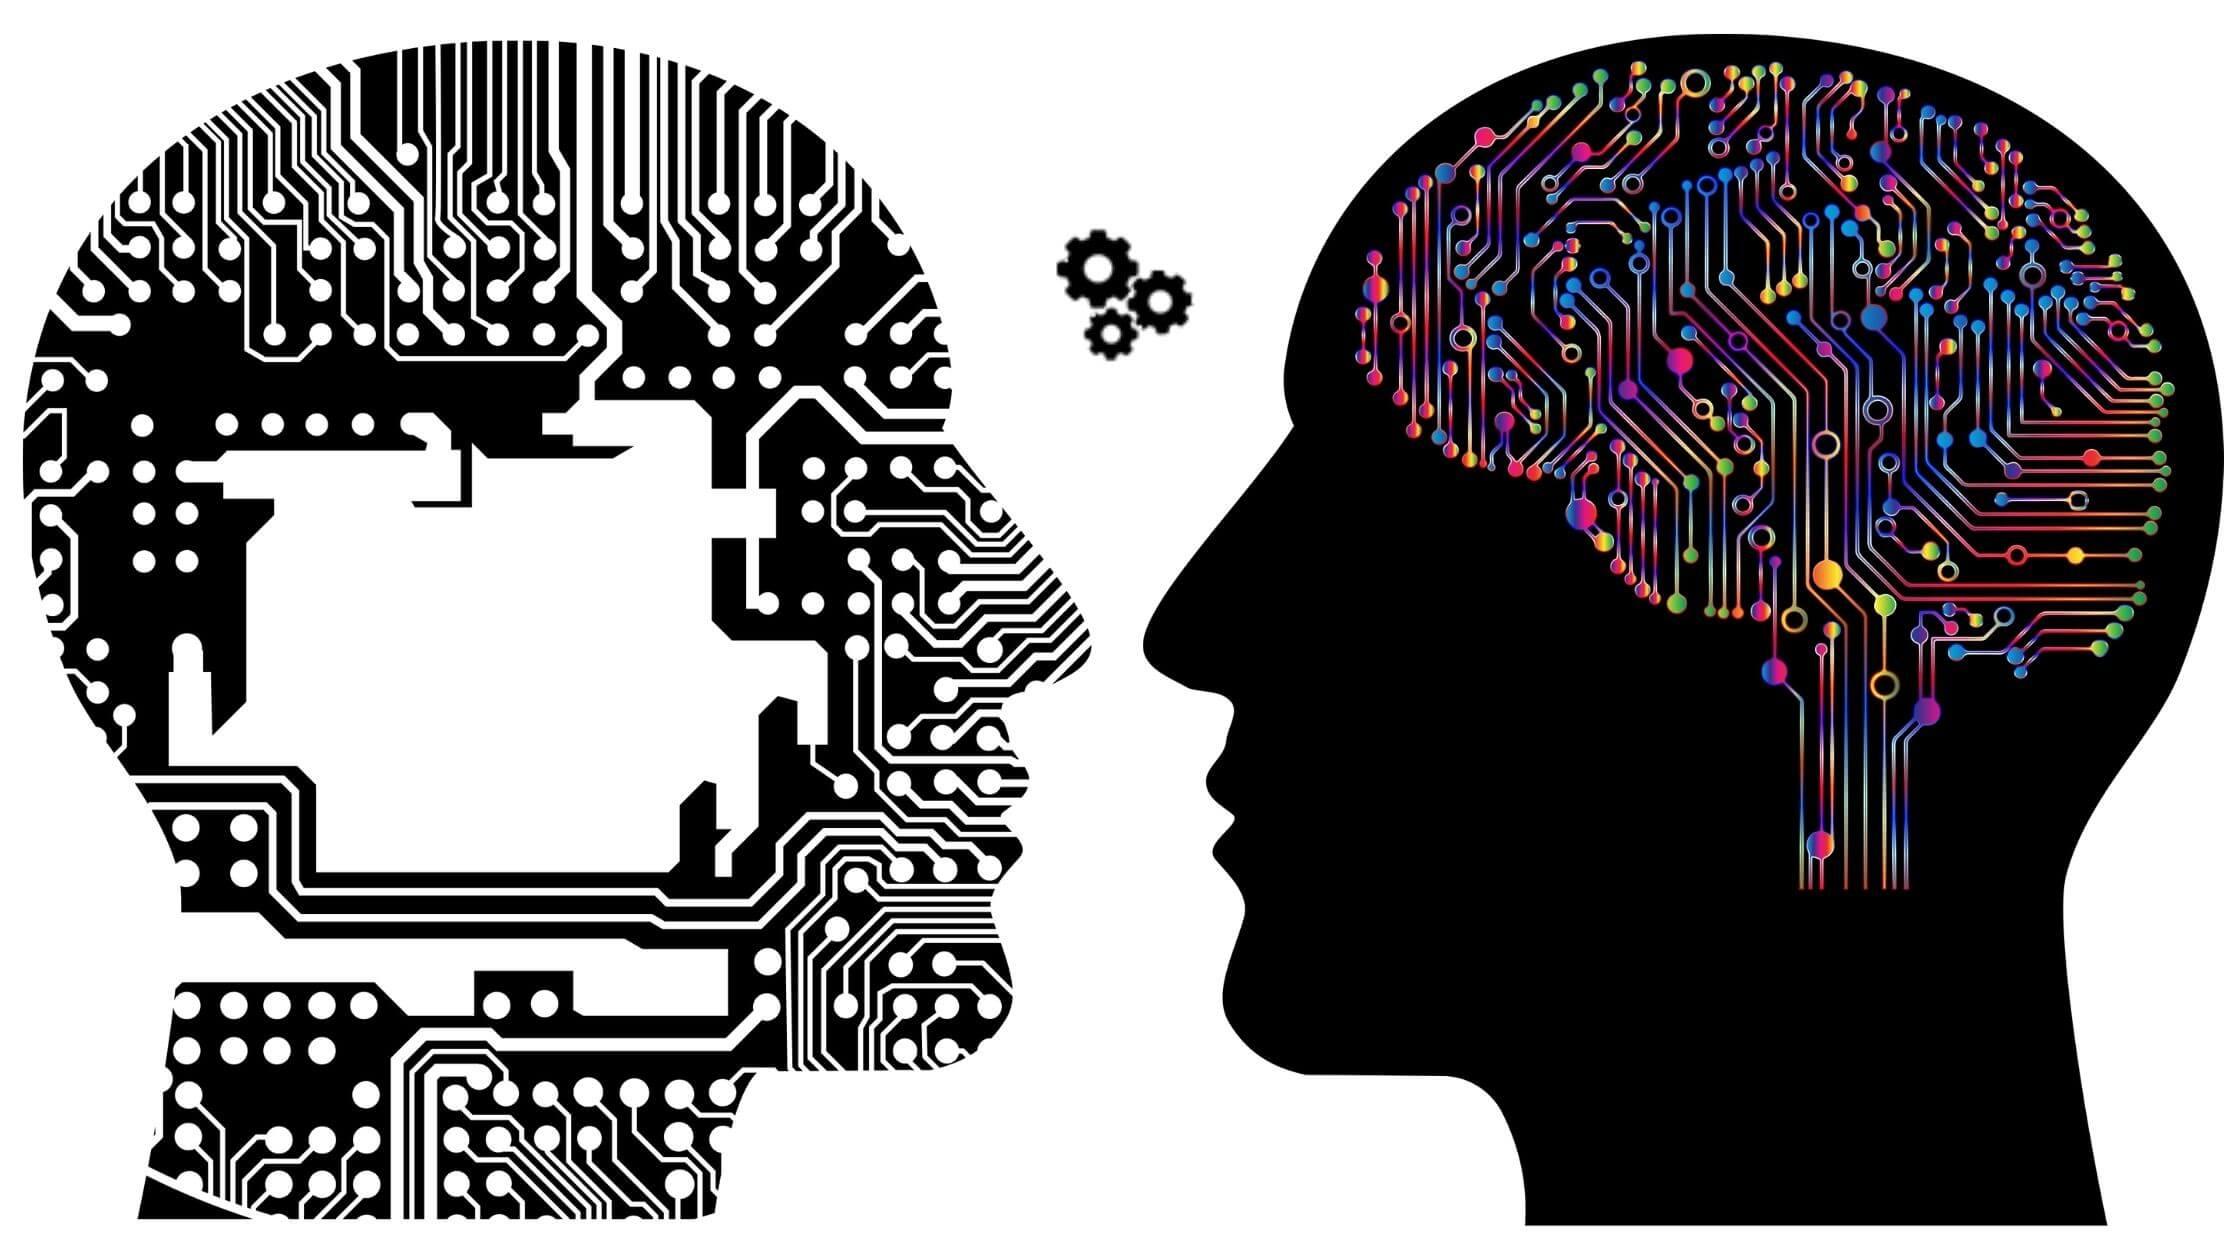 La quarta generazione di intelligenza artificiale